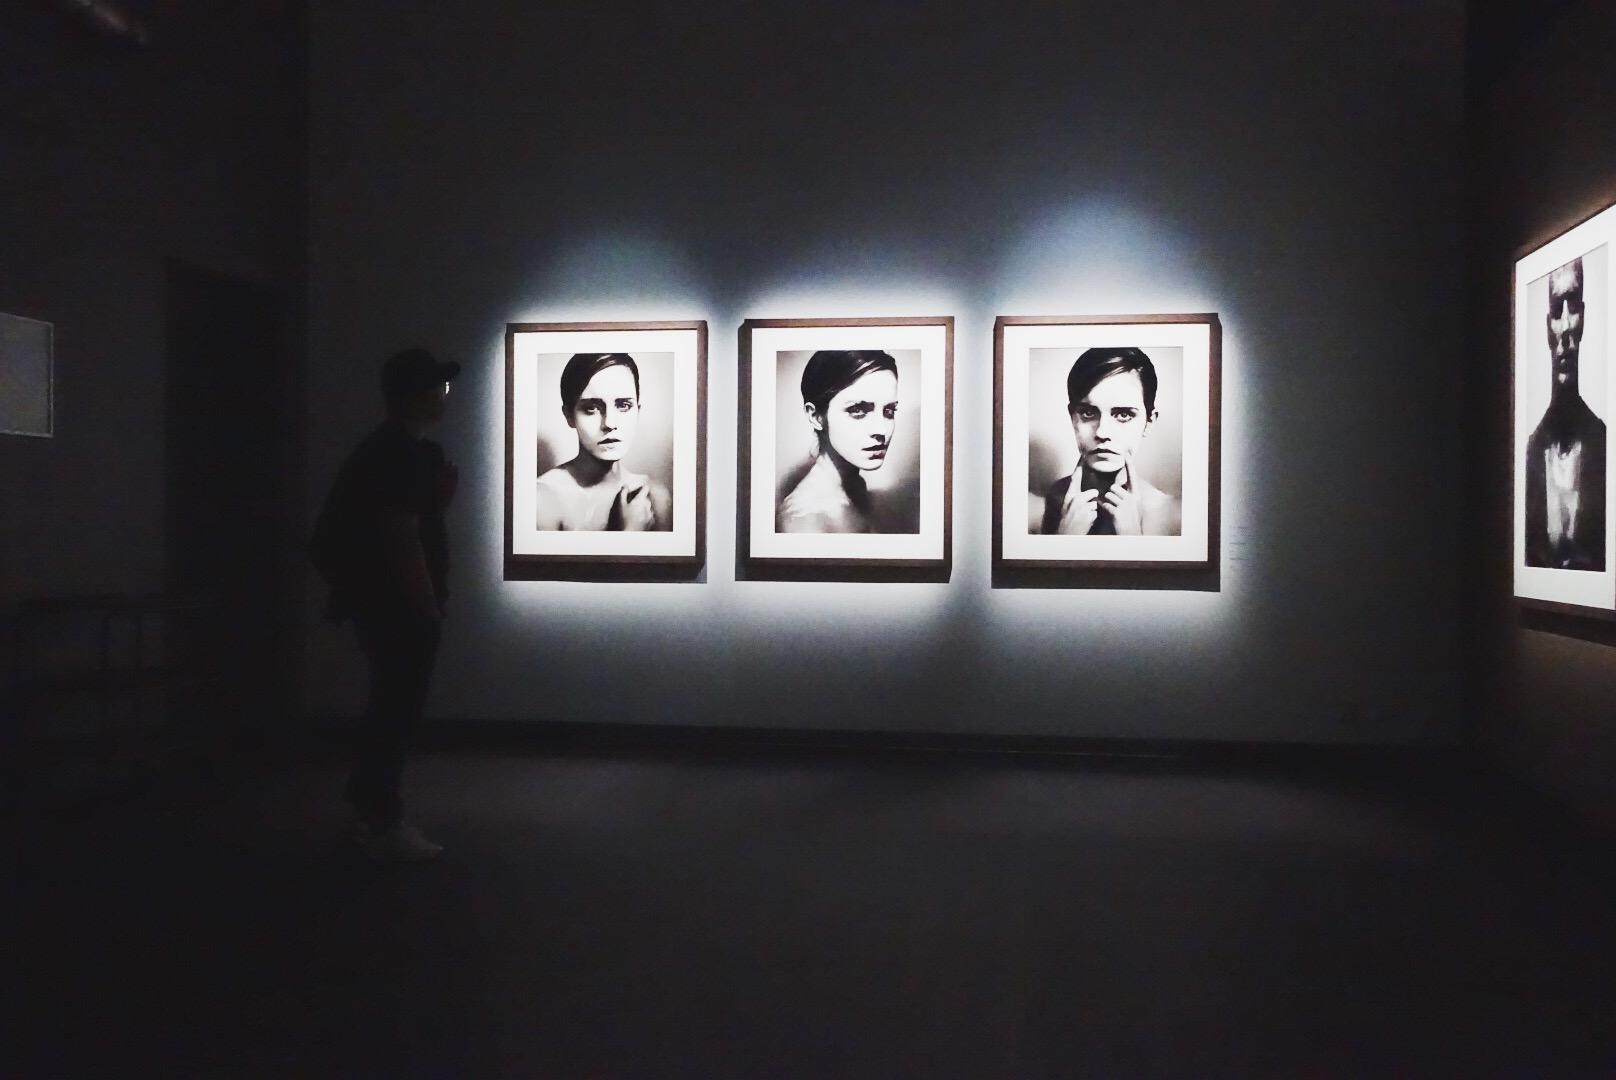 Fotografiska     — an amazing photography museum. Just amazing.